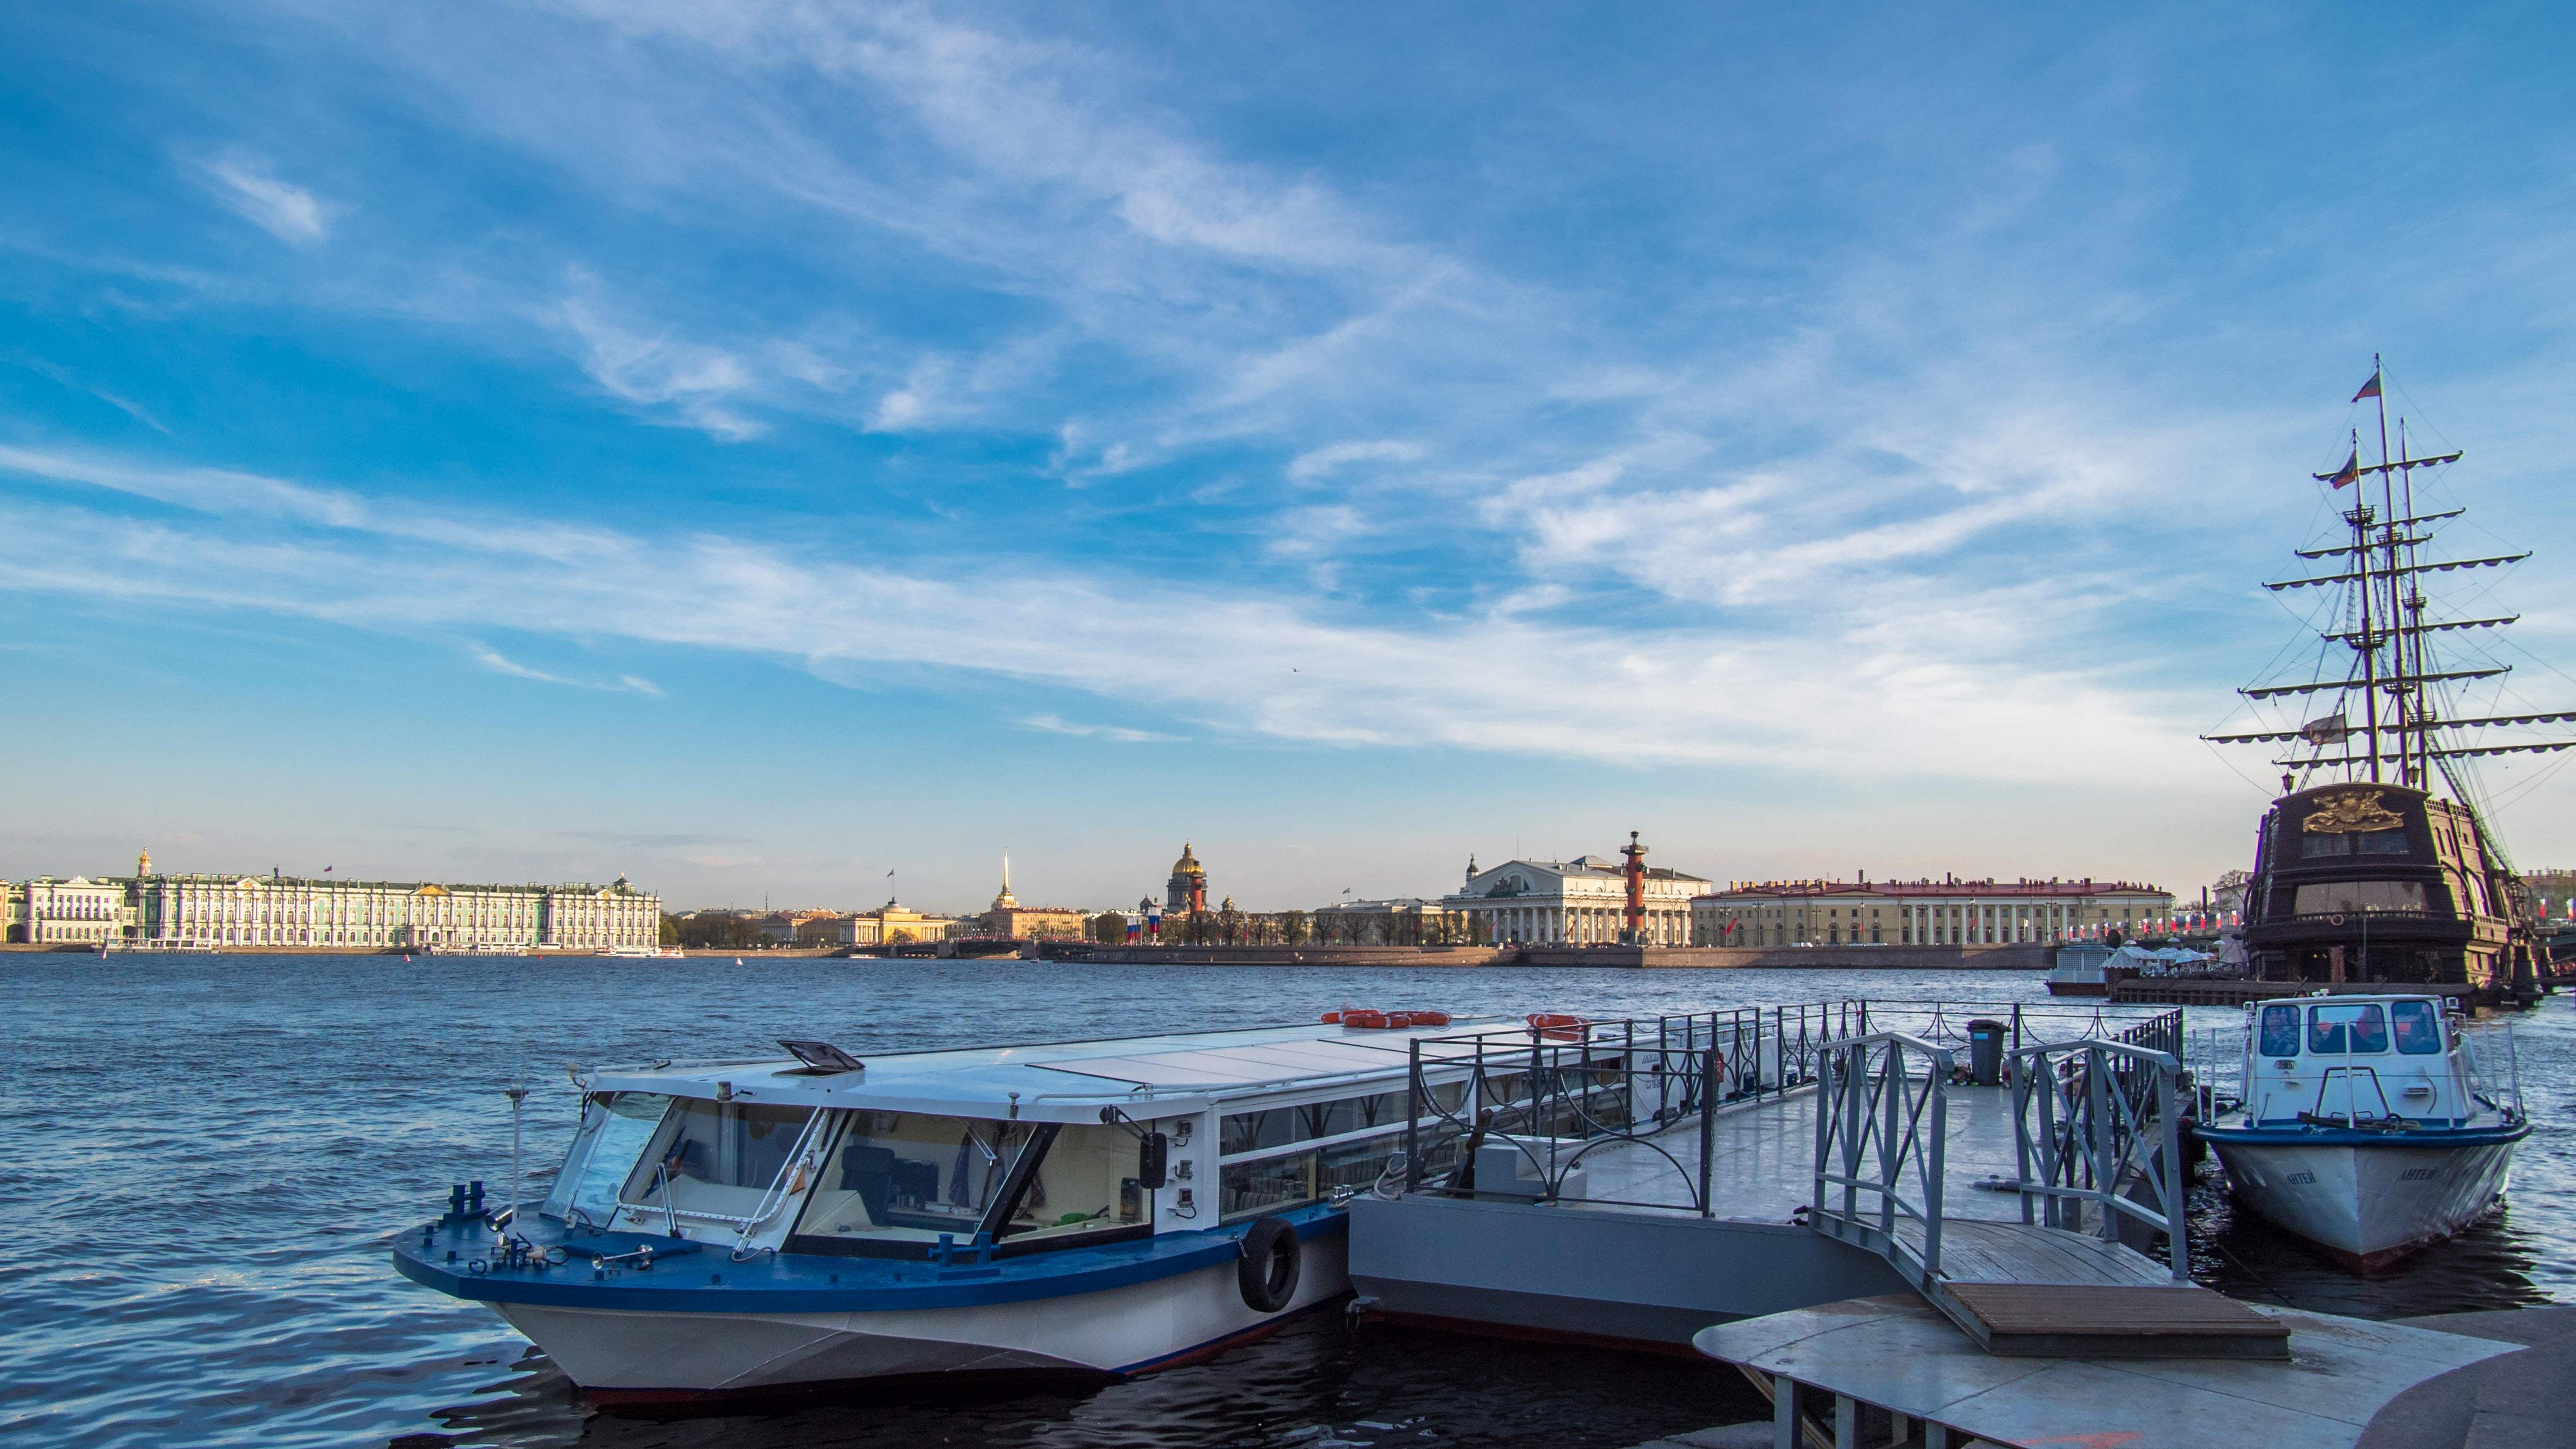 обои Neva river, Saint-Petersburg картинки фото